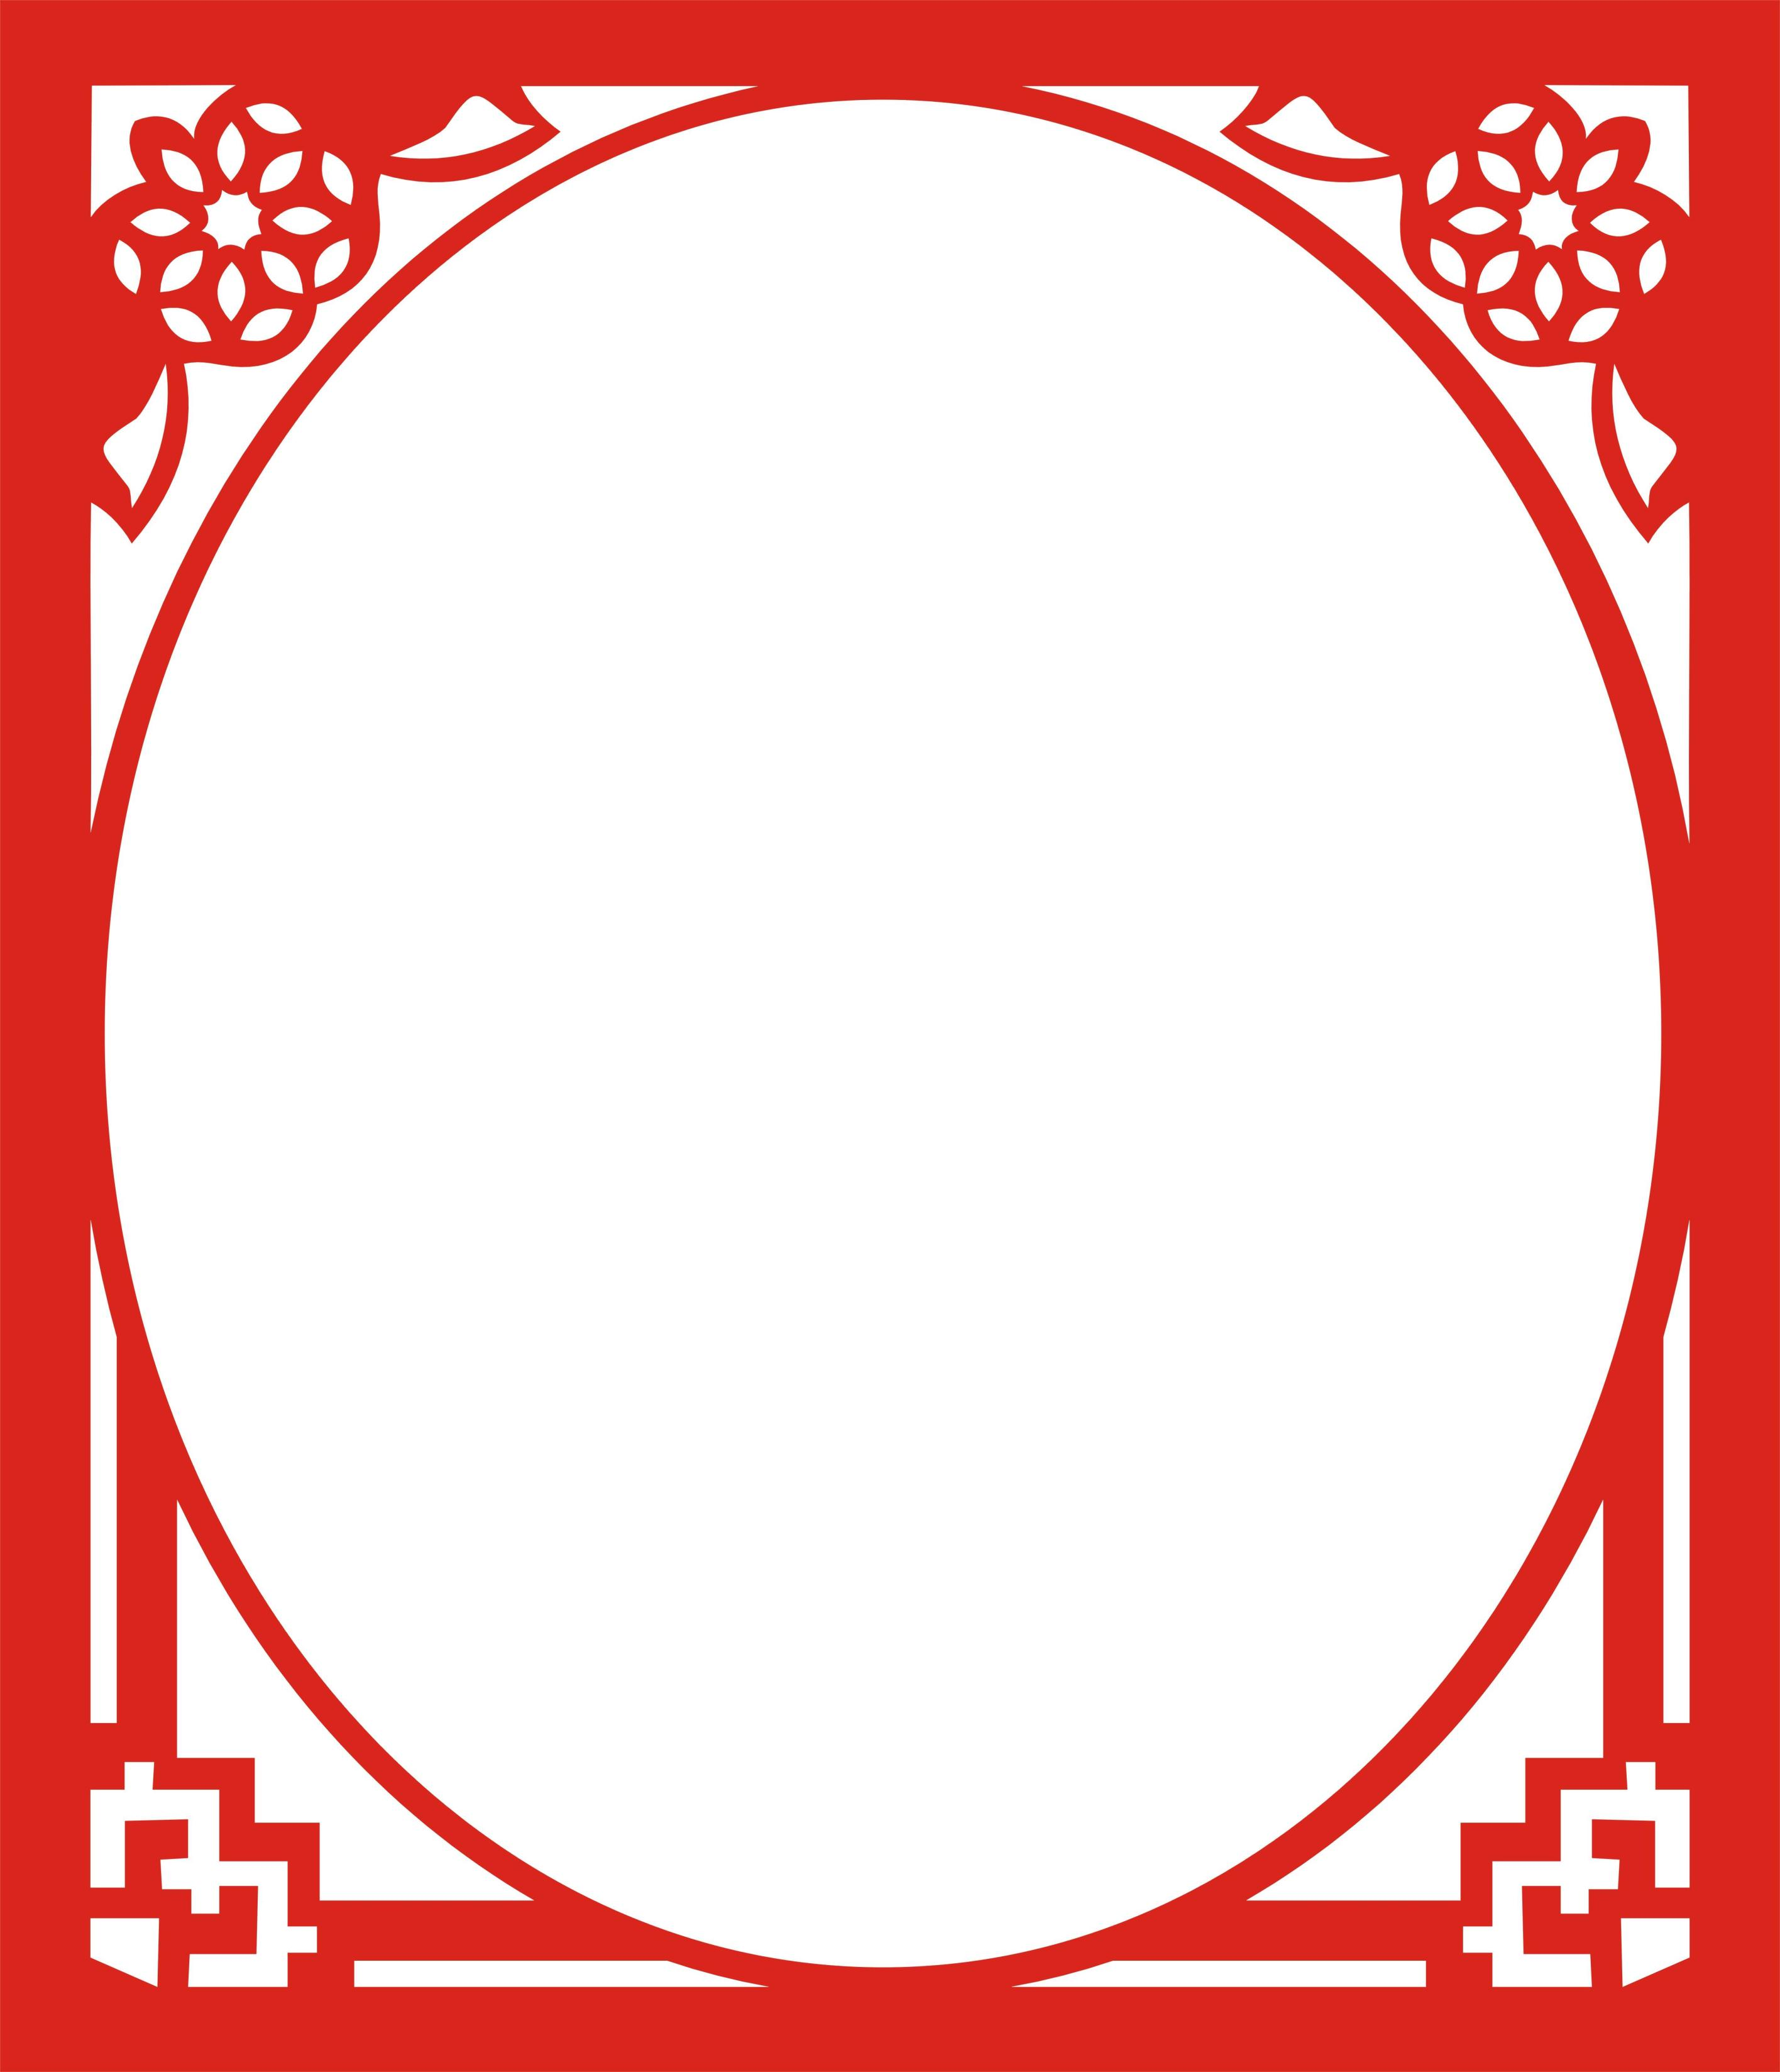 ppt 背景 背景图片 边框 模板 设计 矢量 矢量图 素材 相框 2832_3296